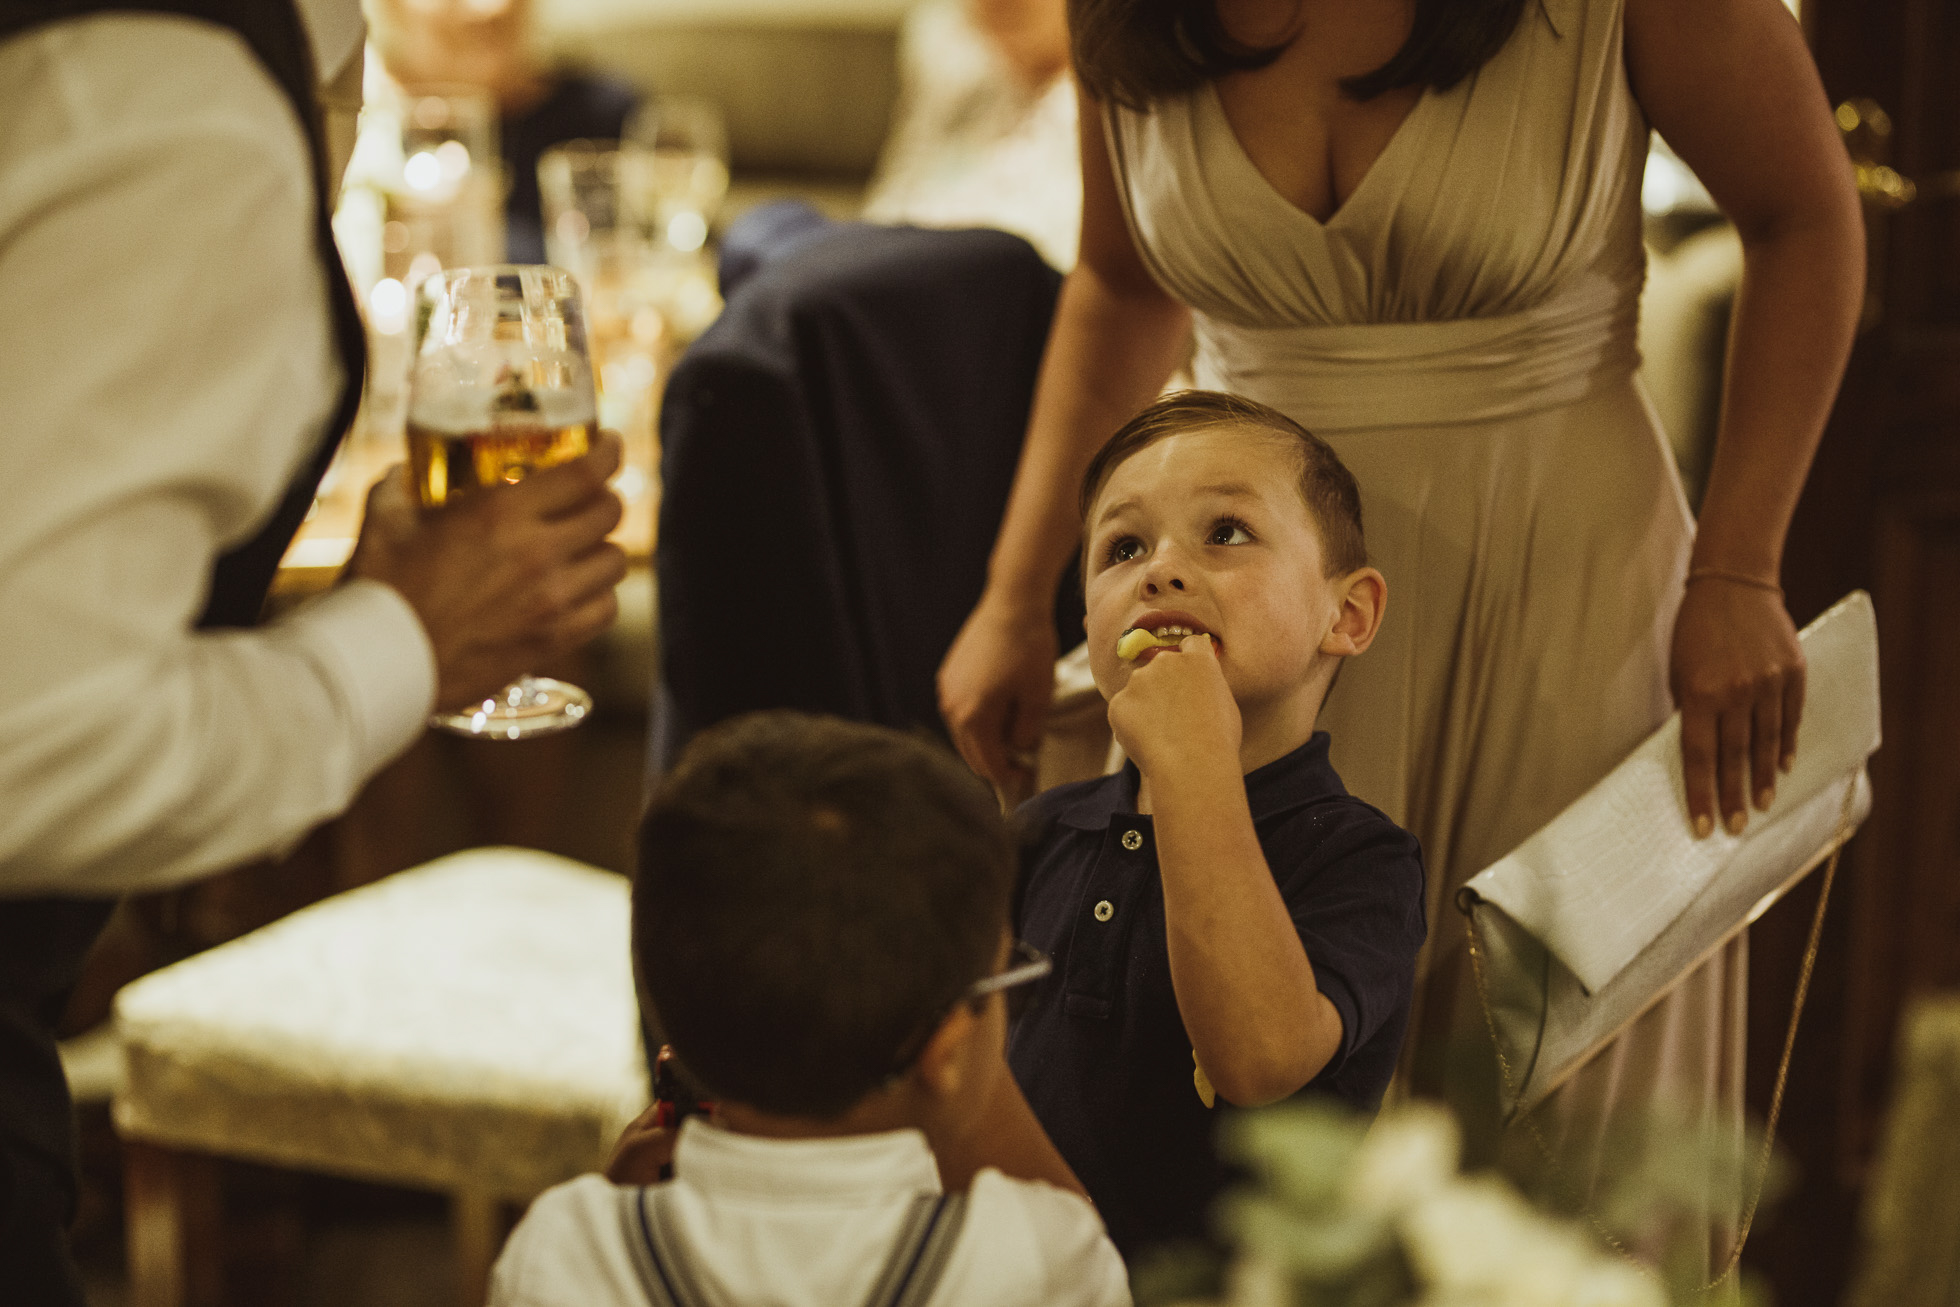 woodman_inn_thunderbridge_wedding_photographer-105.jpg